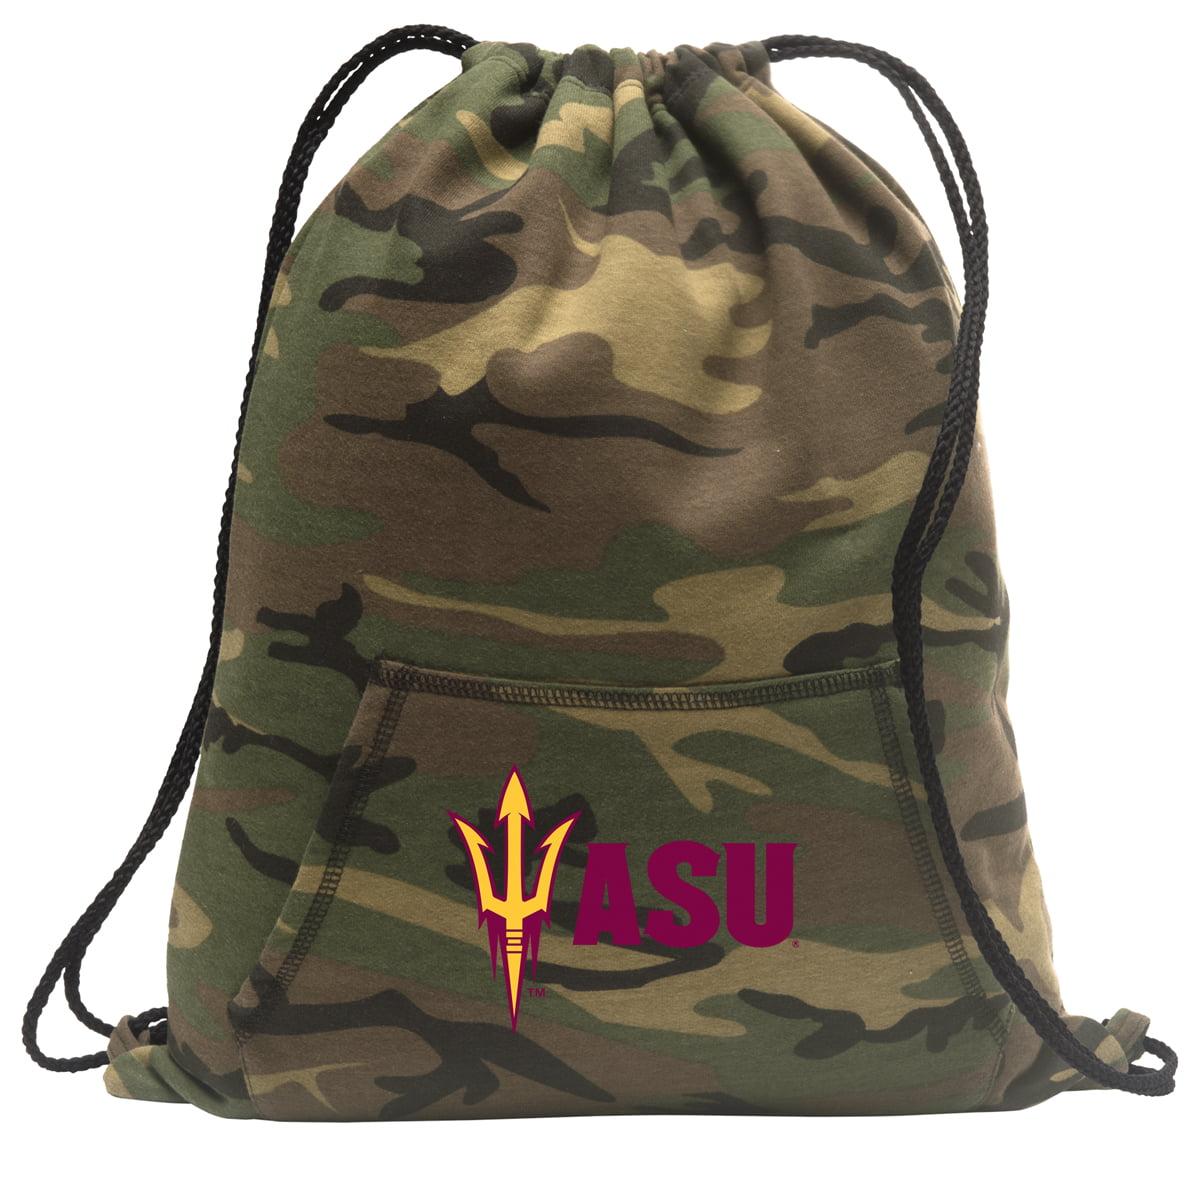 Arizona State Drawstring Bag Camo Arizona State Backpack Cinch Pack for Boys Girls Men Women